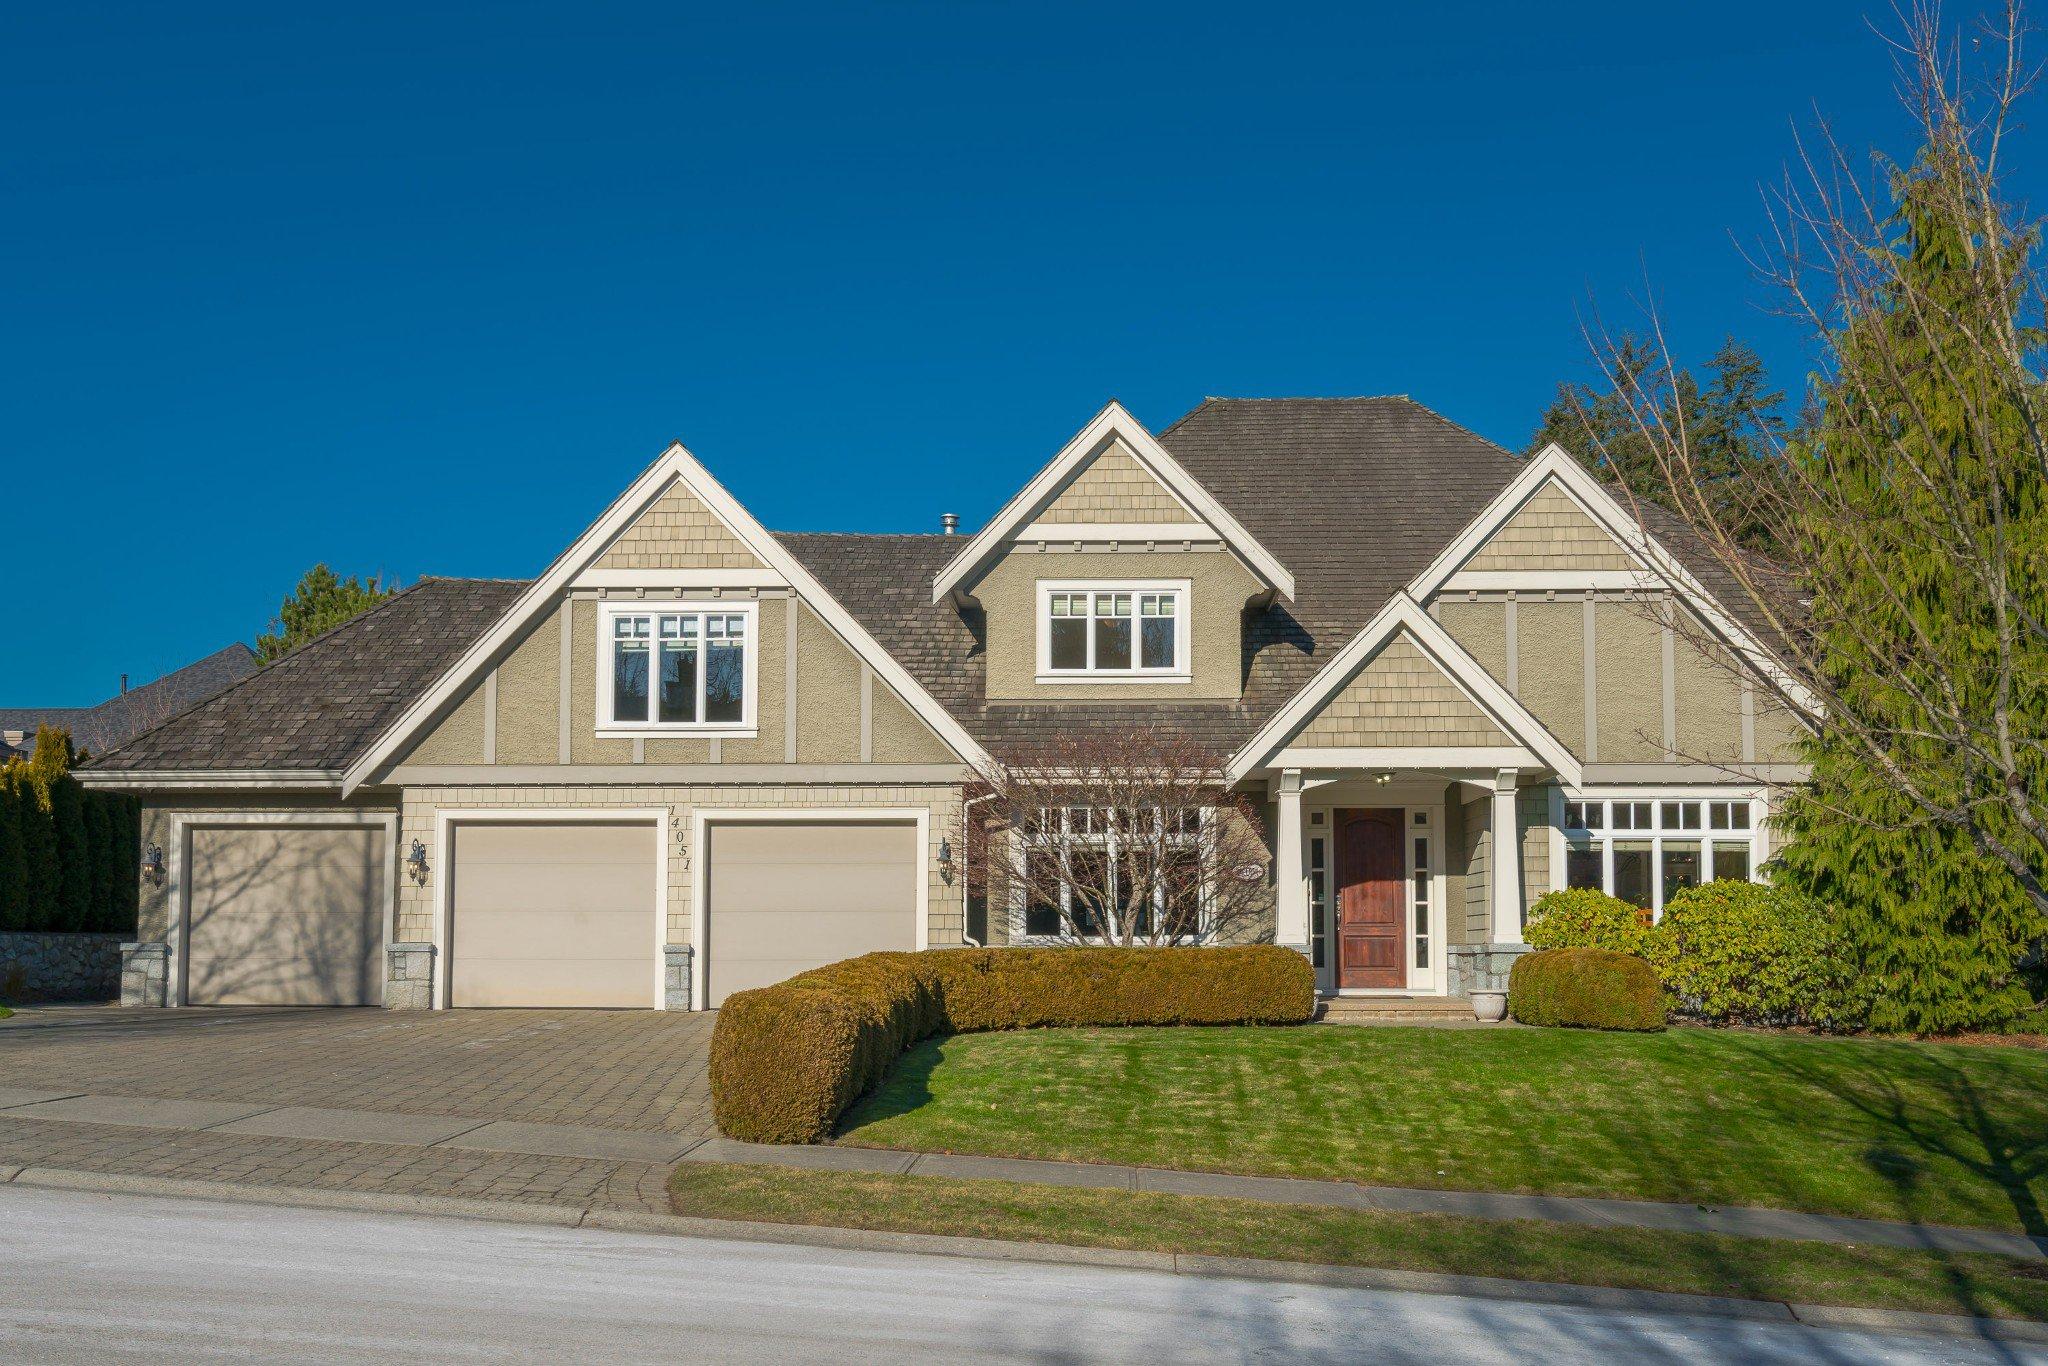 "Main Photo: 14051 30 Avenue in Surrey: Elgin Chantrell House for sale in ""ELGIN PARK ESTATES"" (South Surrey White Rock)  : MLS®# R2367026"